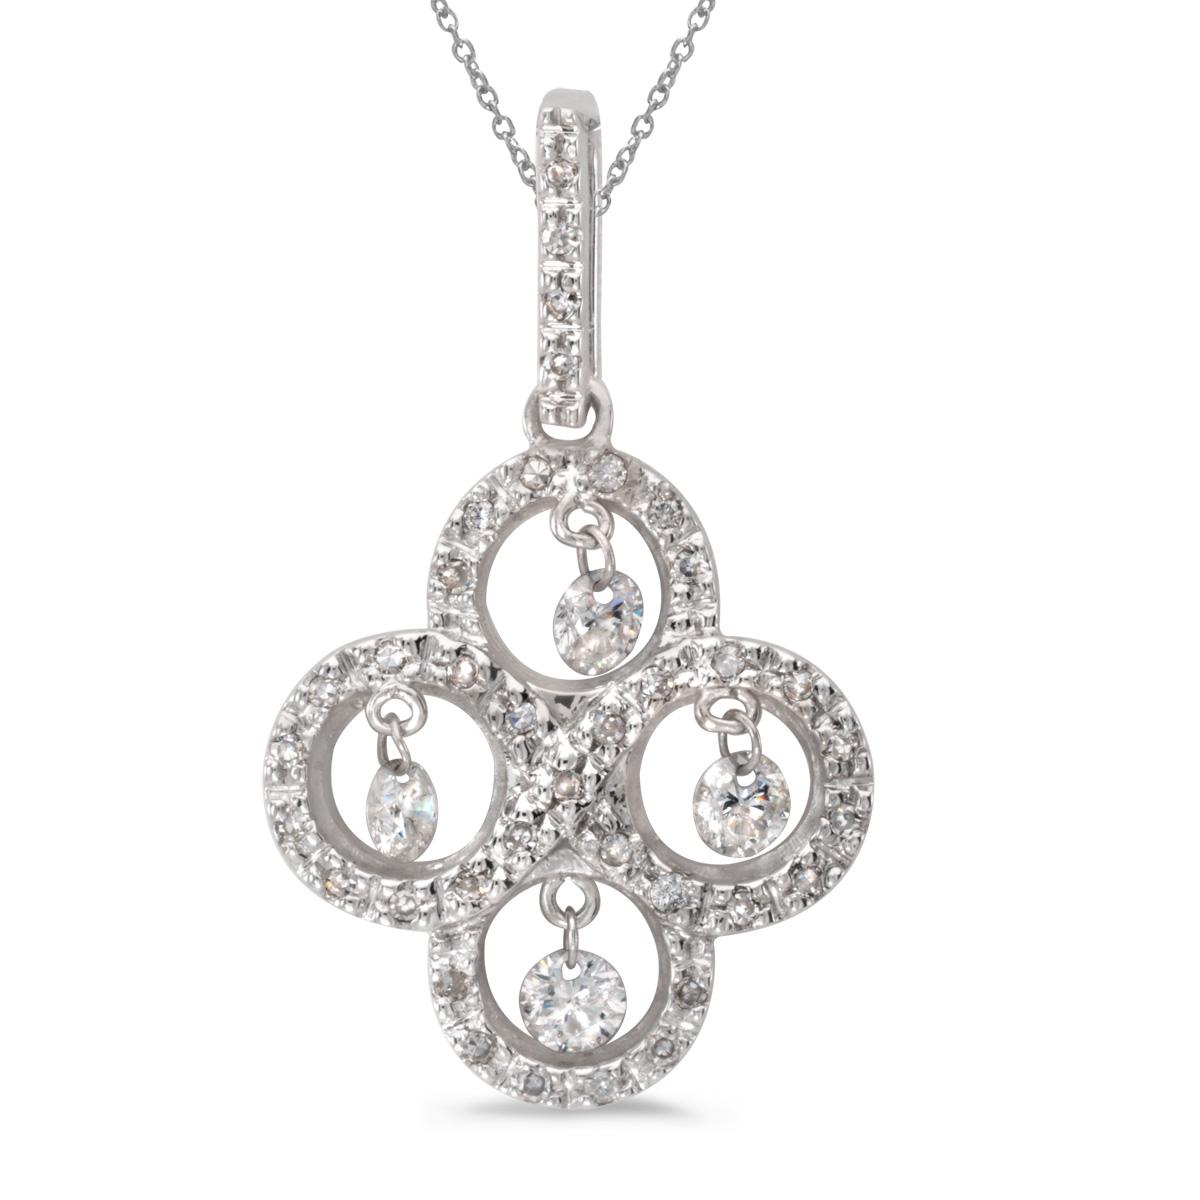 14k gold Dashinng Diamonds pendant with 0.43 total ct diamonds. The center dangling diamond dance...